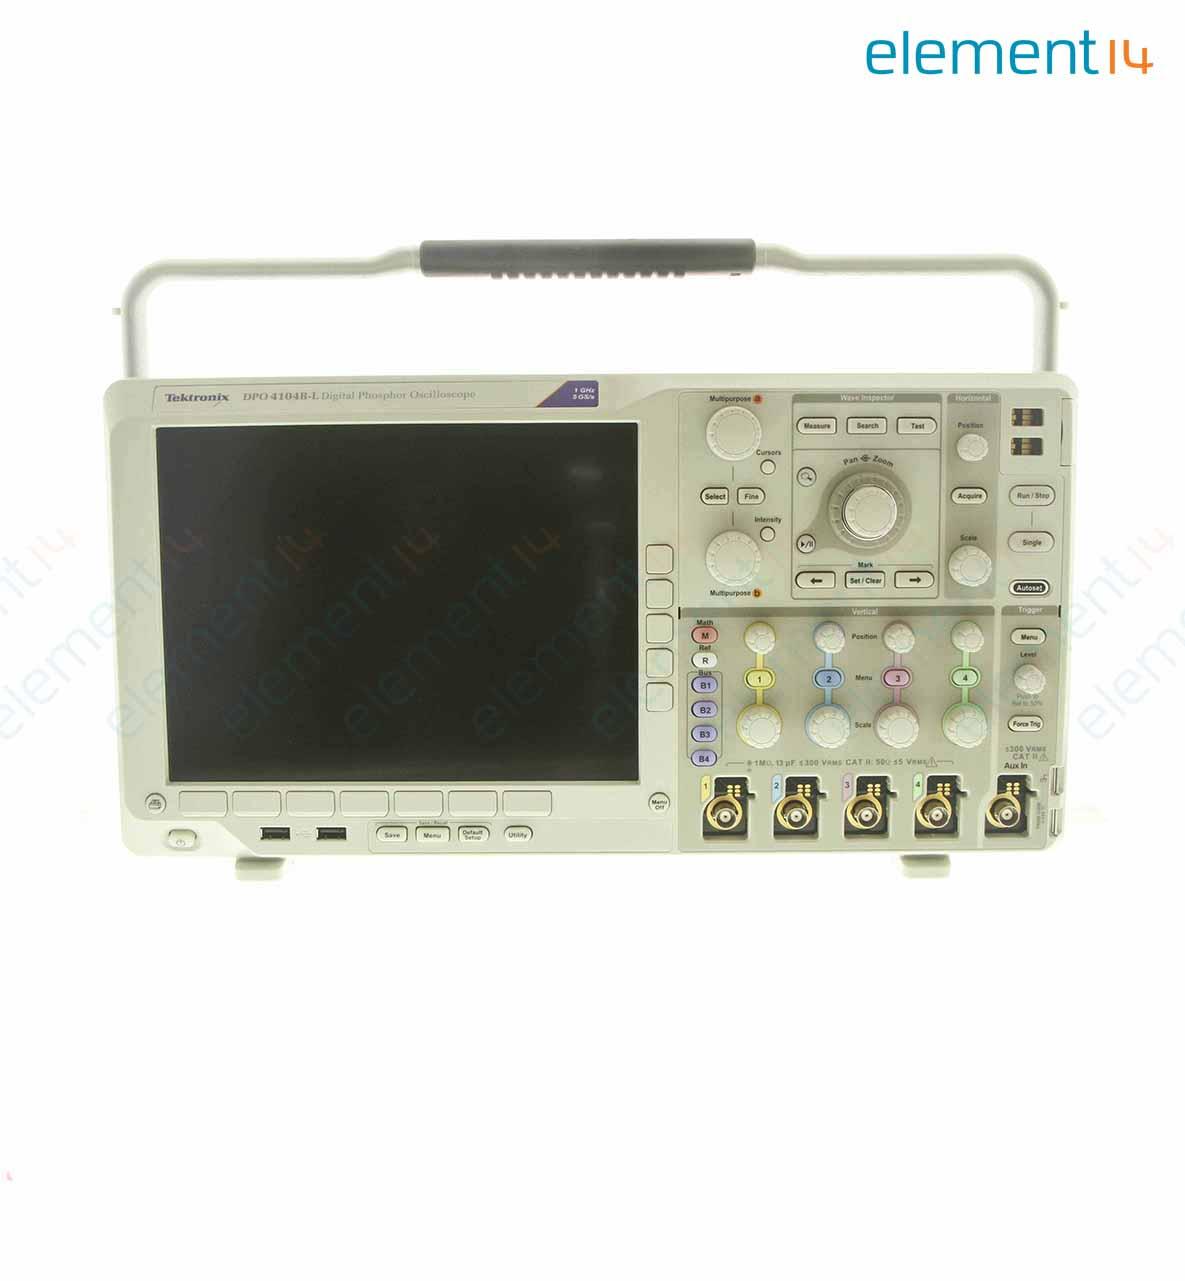 Dpo4104b L Tektronix Oscilloscope 4 Channel 1 Ghz R Integrated Circuit Tester Ic Led Test Optocoupler Richmedia 9400b En